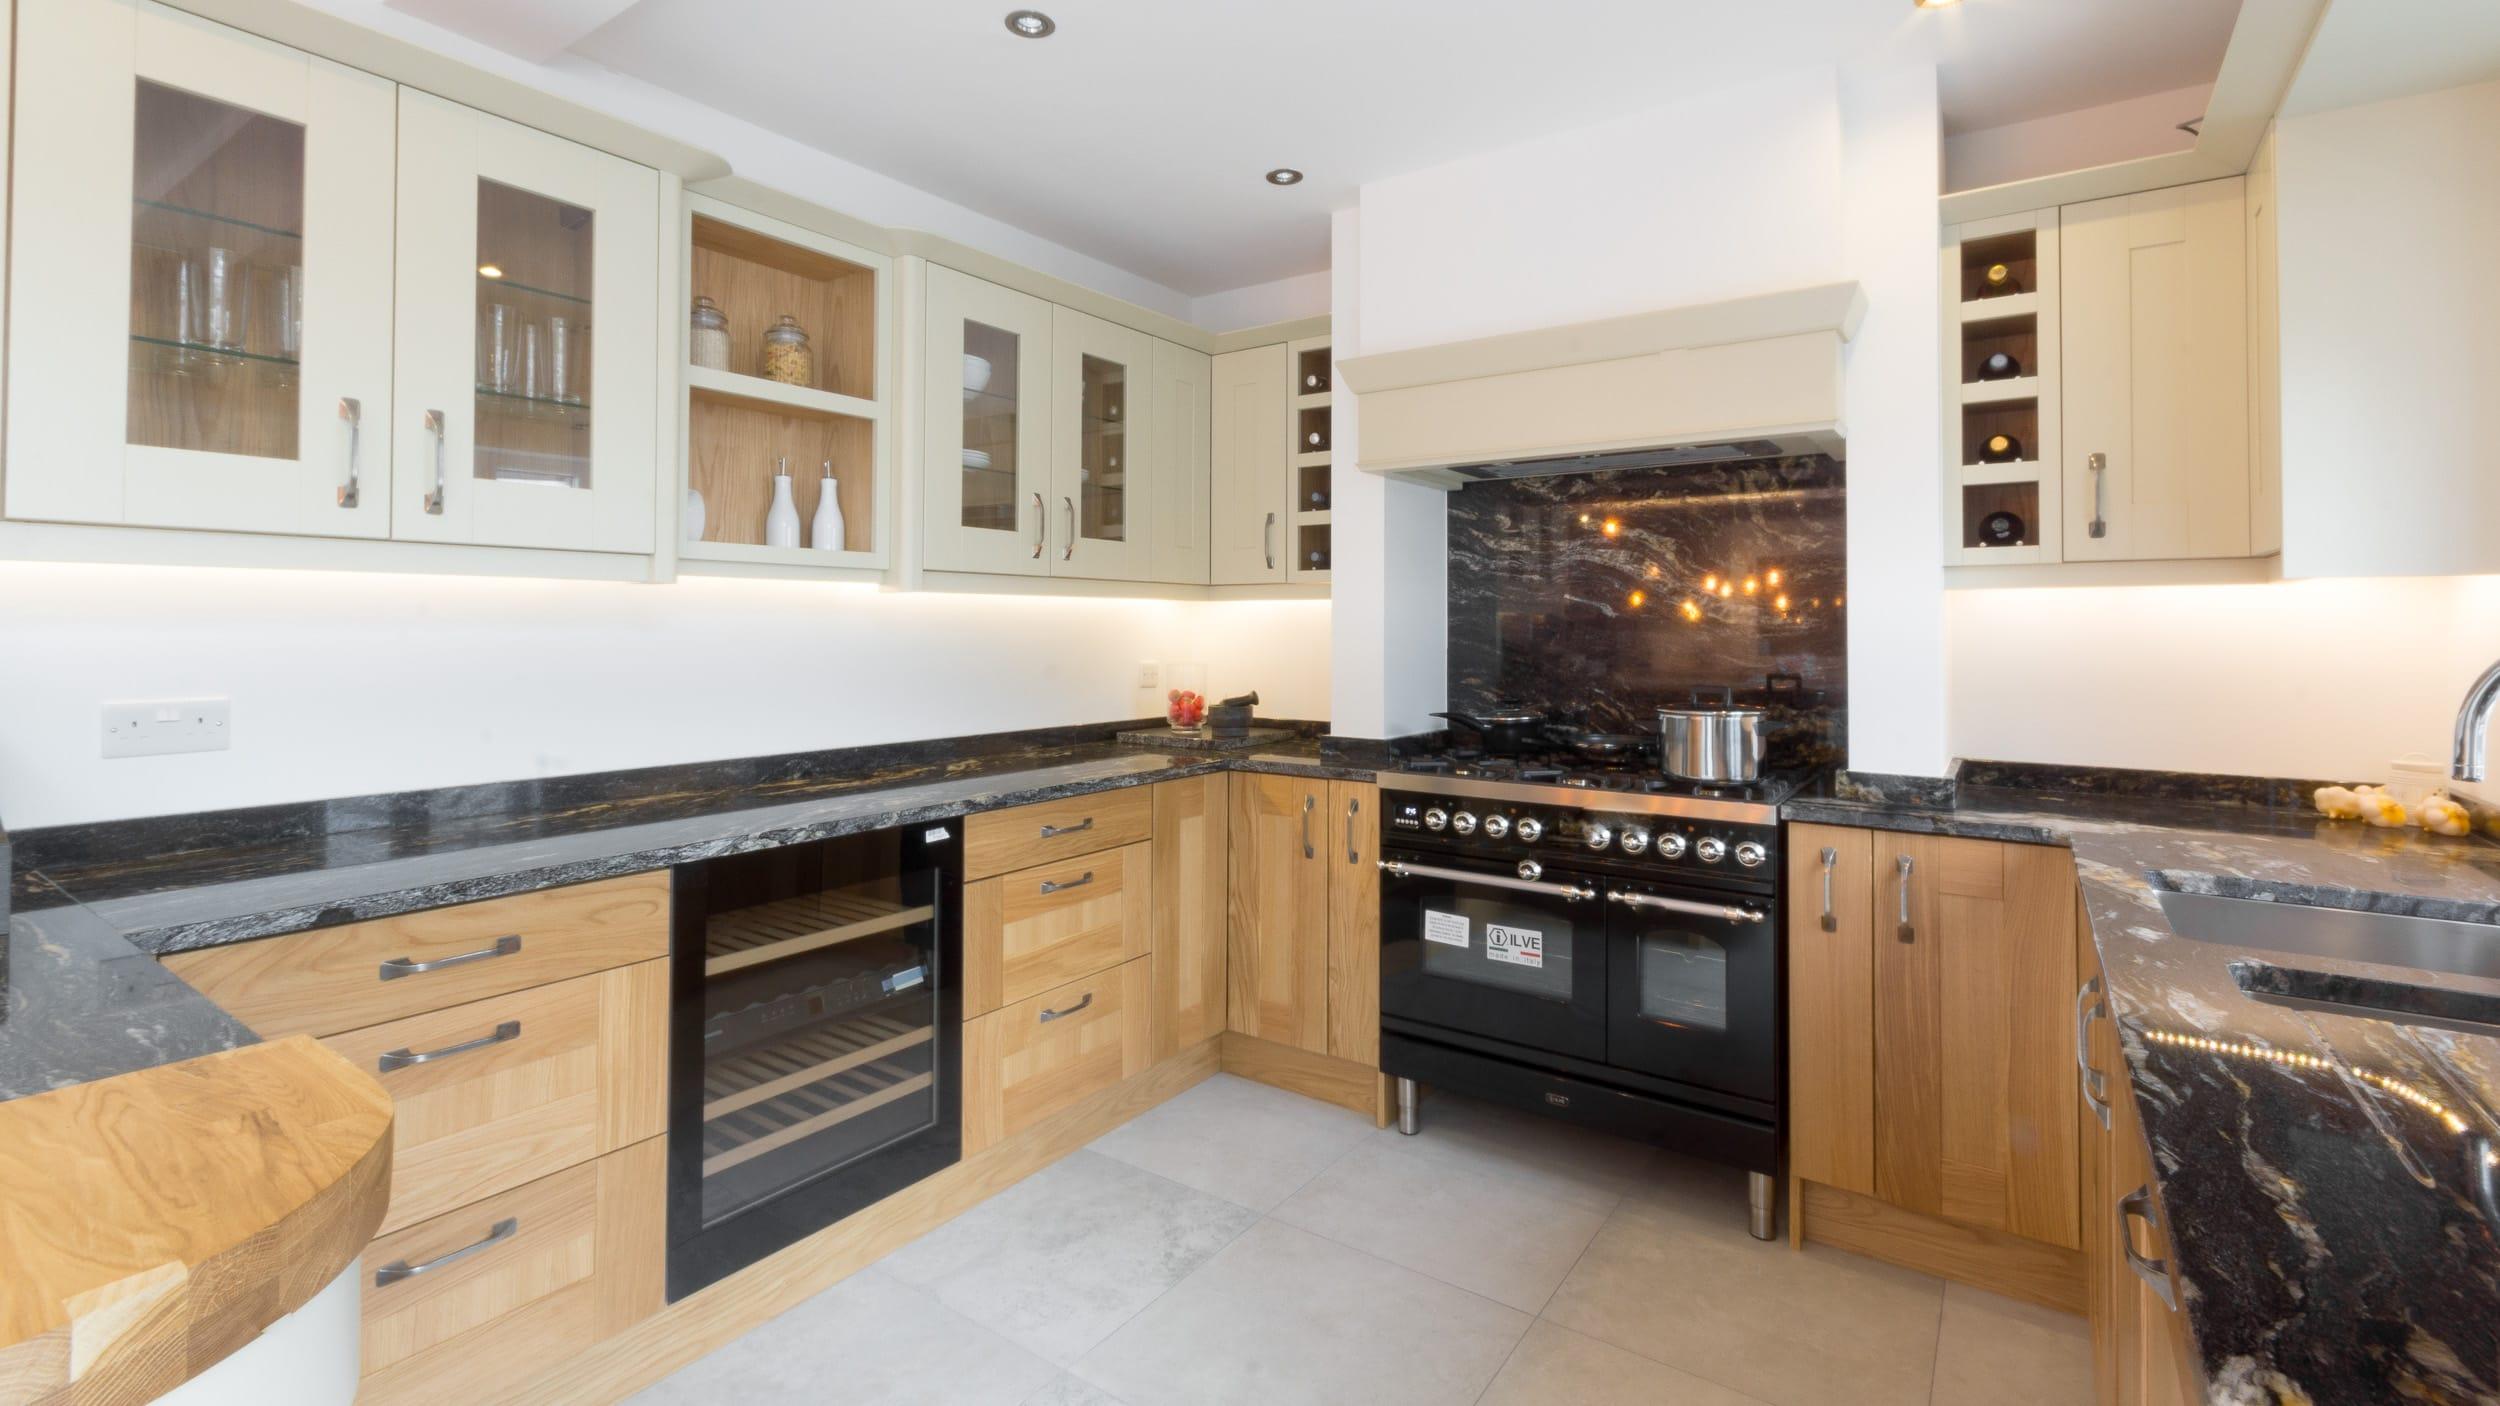 Kitchen-Showroom-Webbs-Kendal-36.jpg